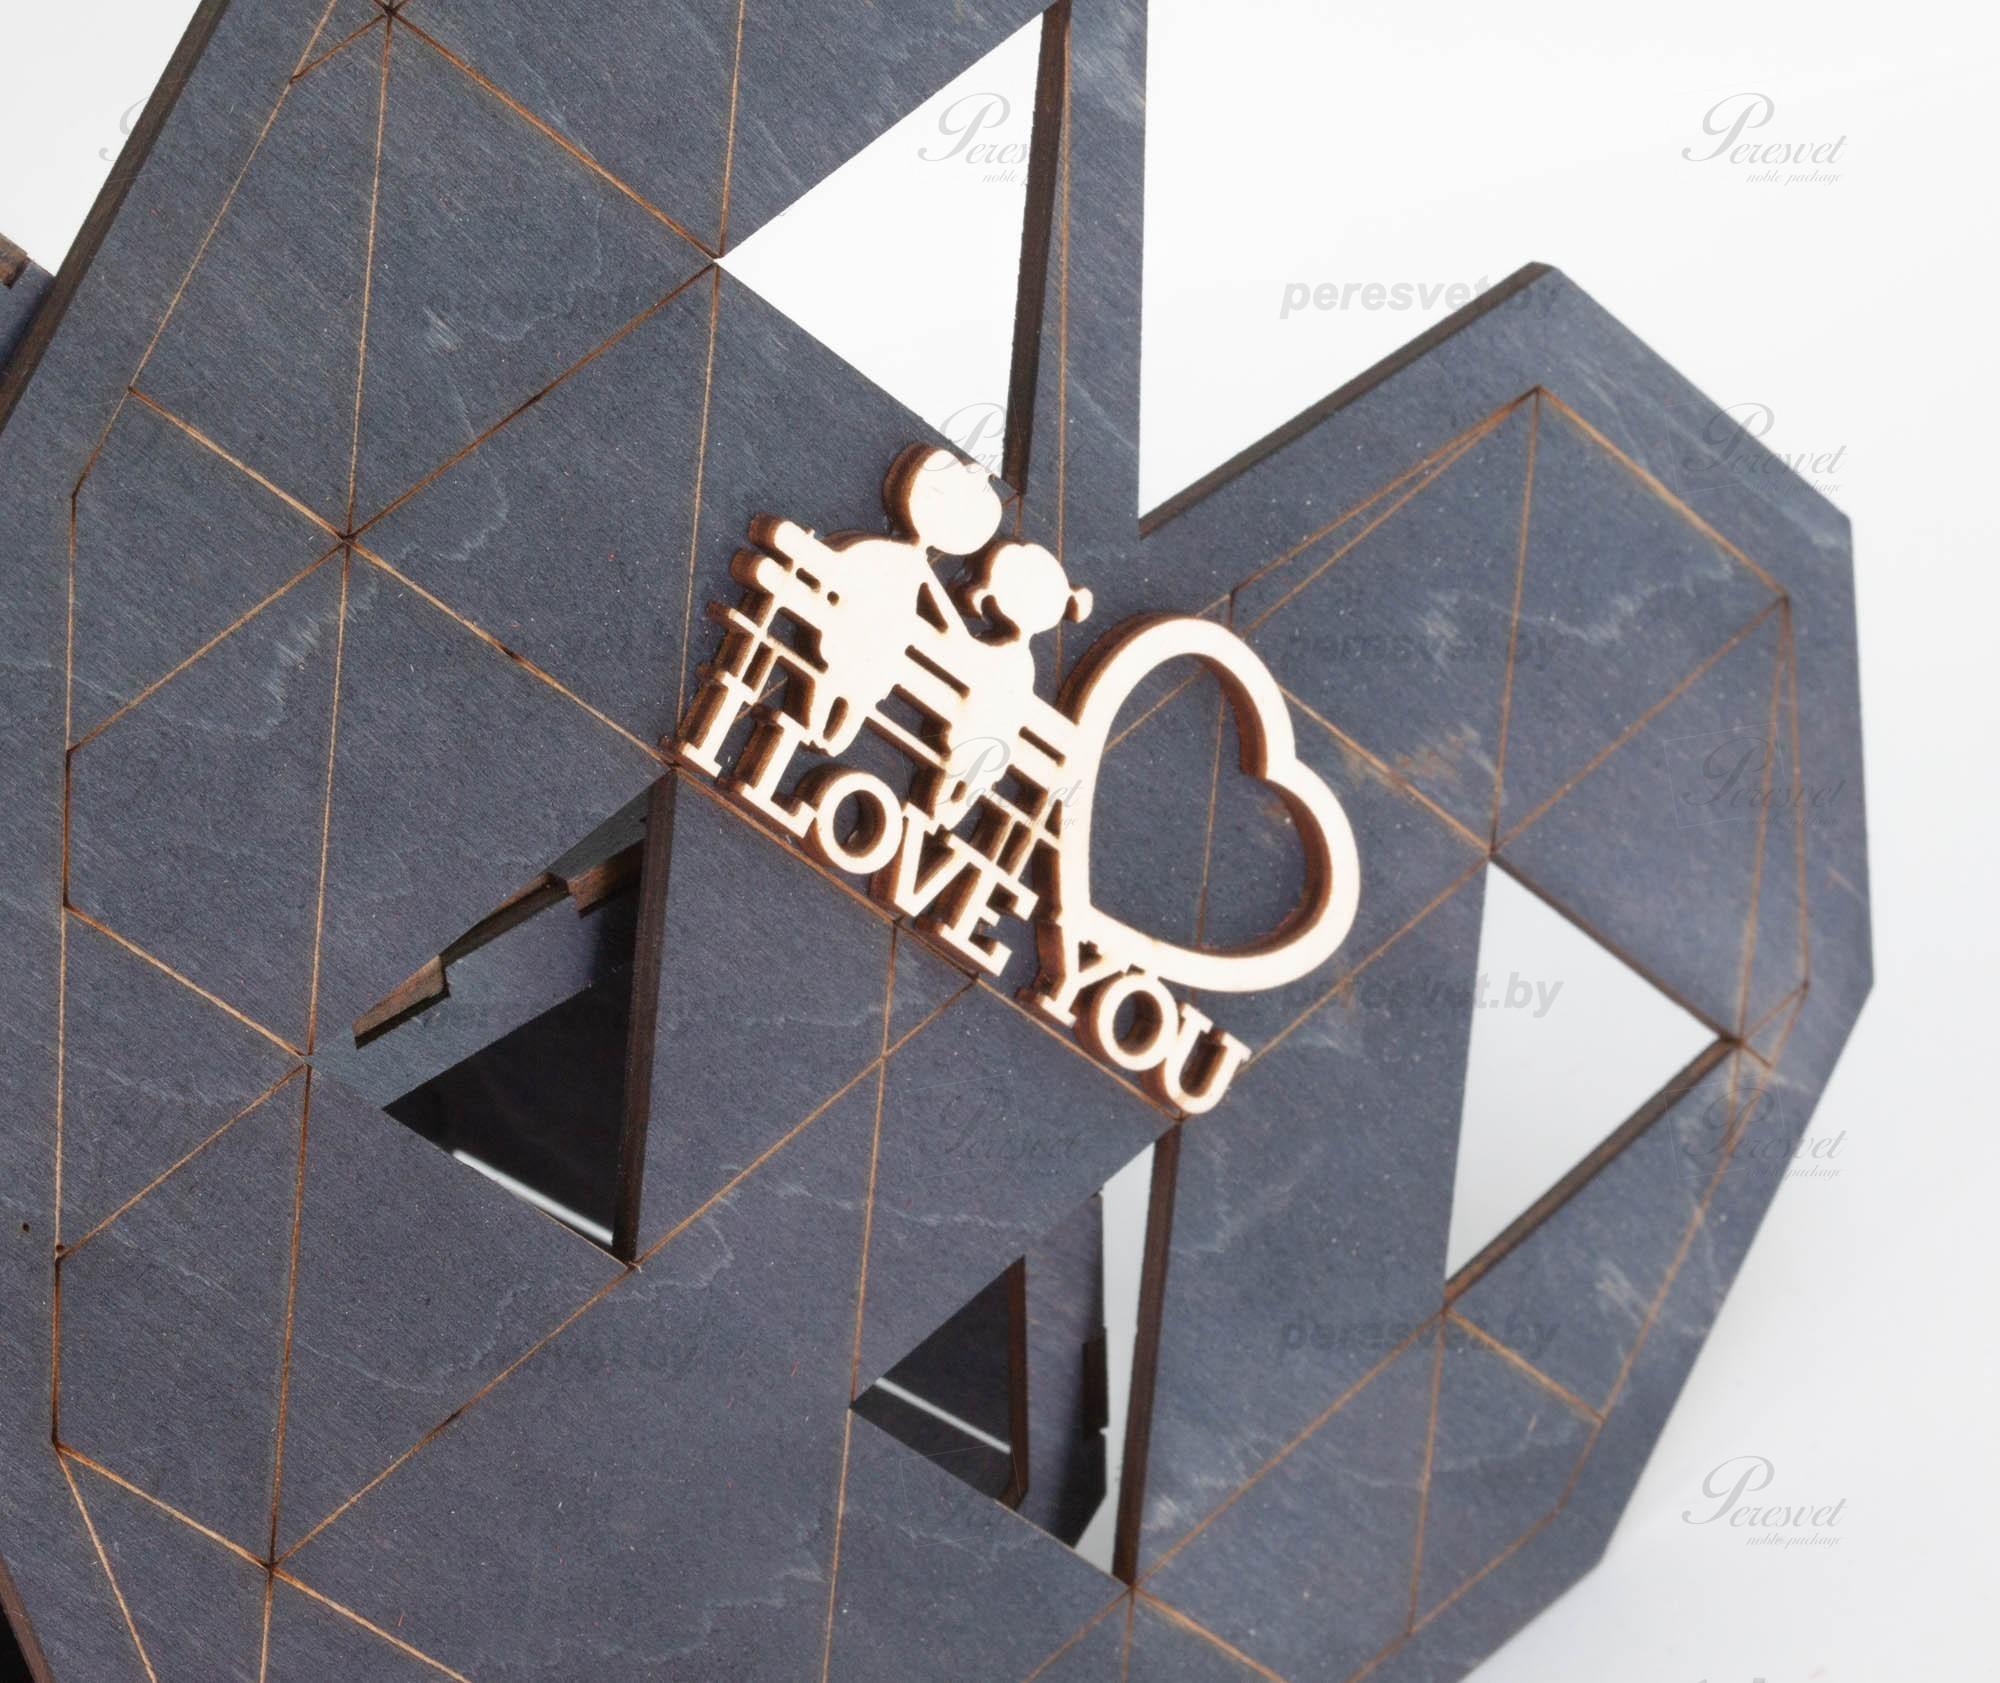 Подарочная коробка Сердце для любимой черное на peresvet.by